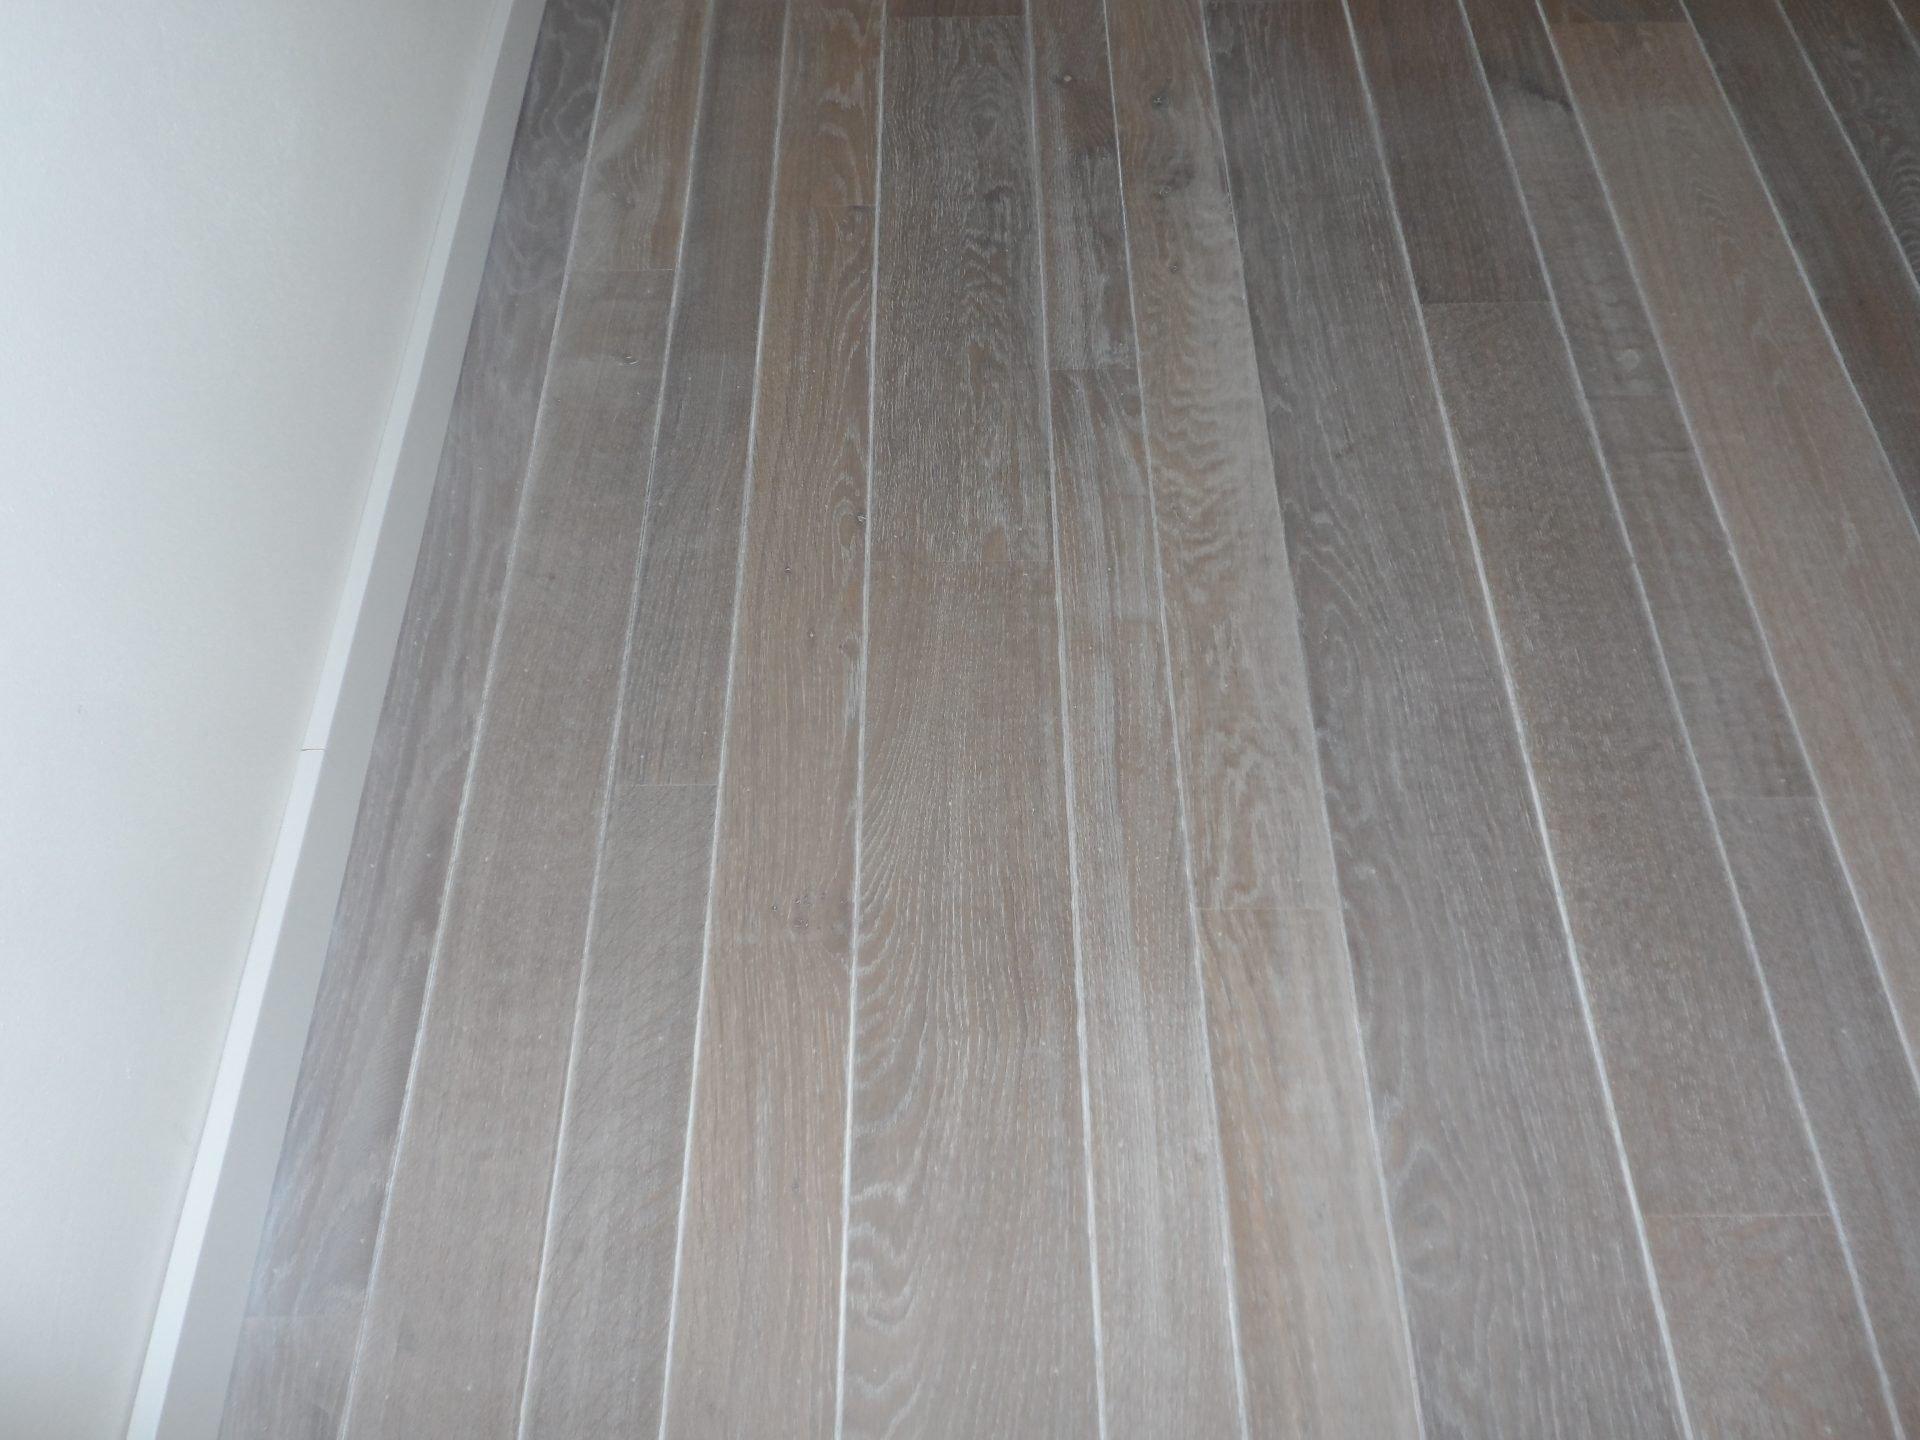 9-eiken-tapisvloer-en-trap-gerookt-ingekleurd-met-extra-wit-10